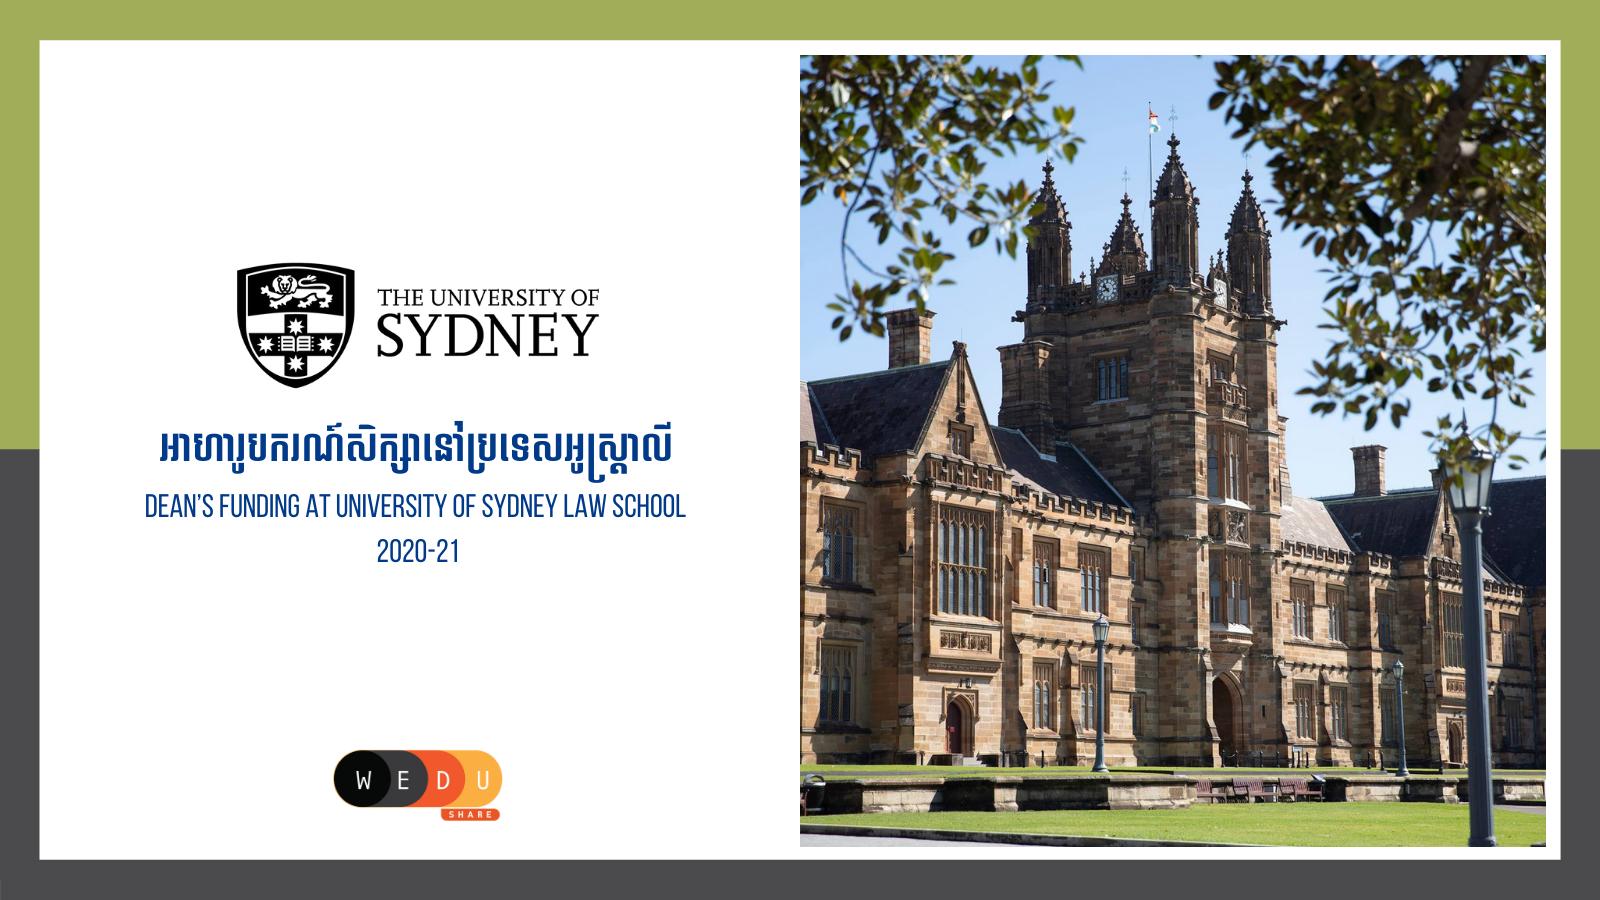 Dean's Funding At University Of Sydney Law School 2020-21